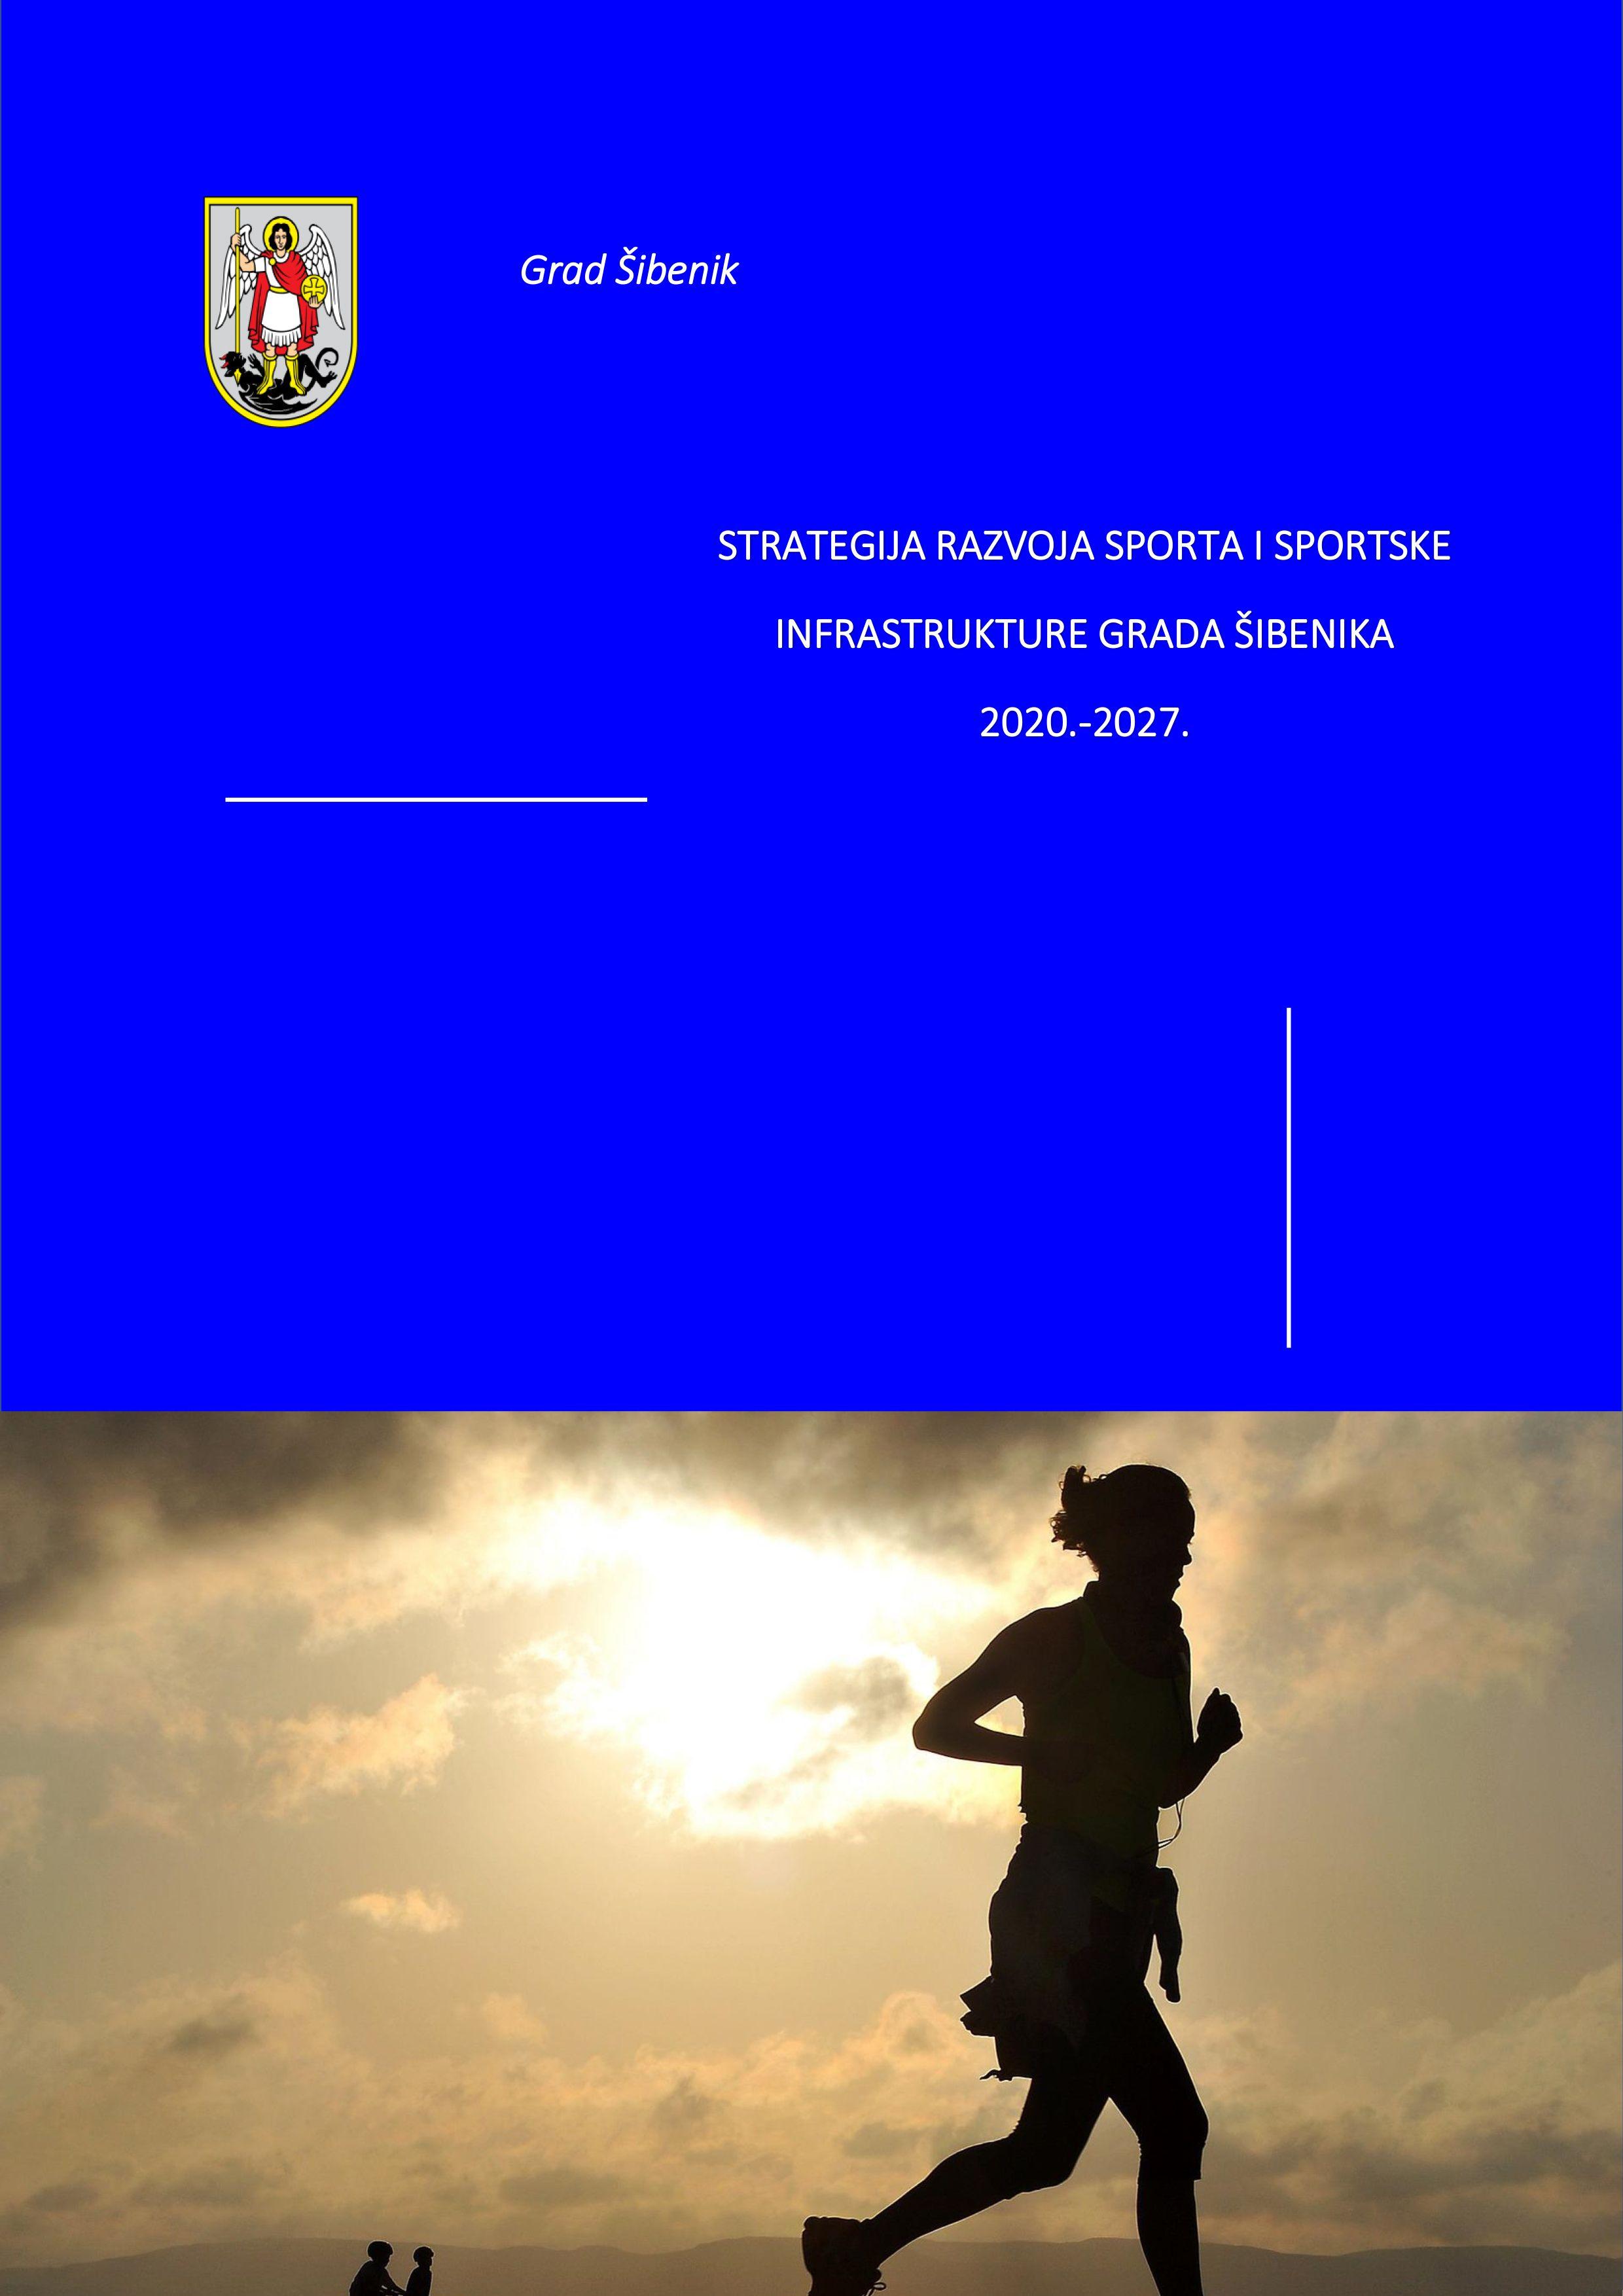 Strategija razvoja sporta grada Šibenika